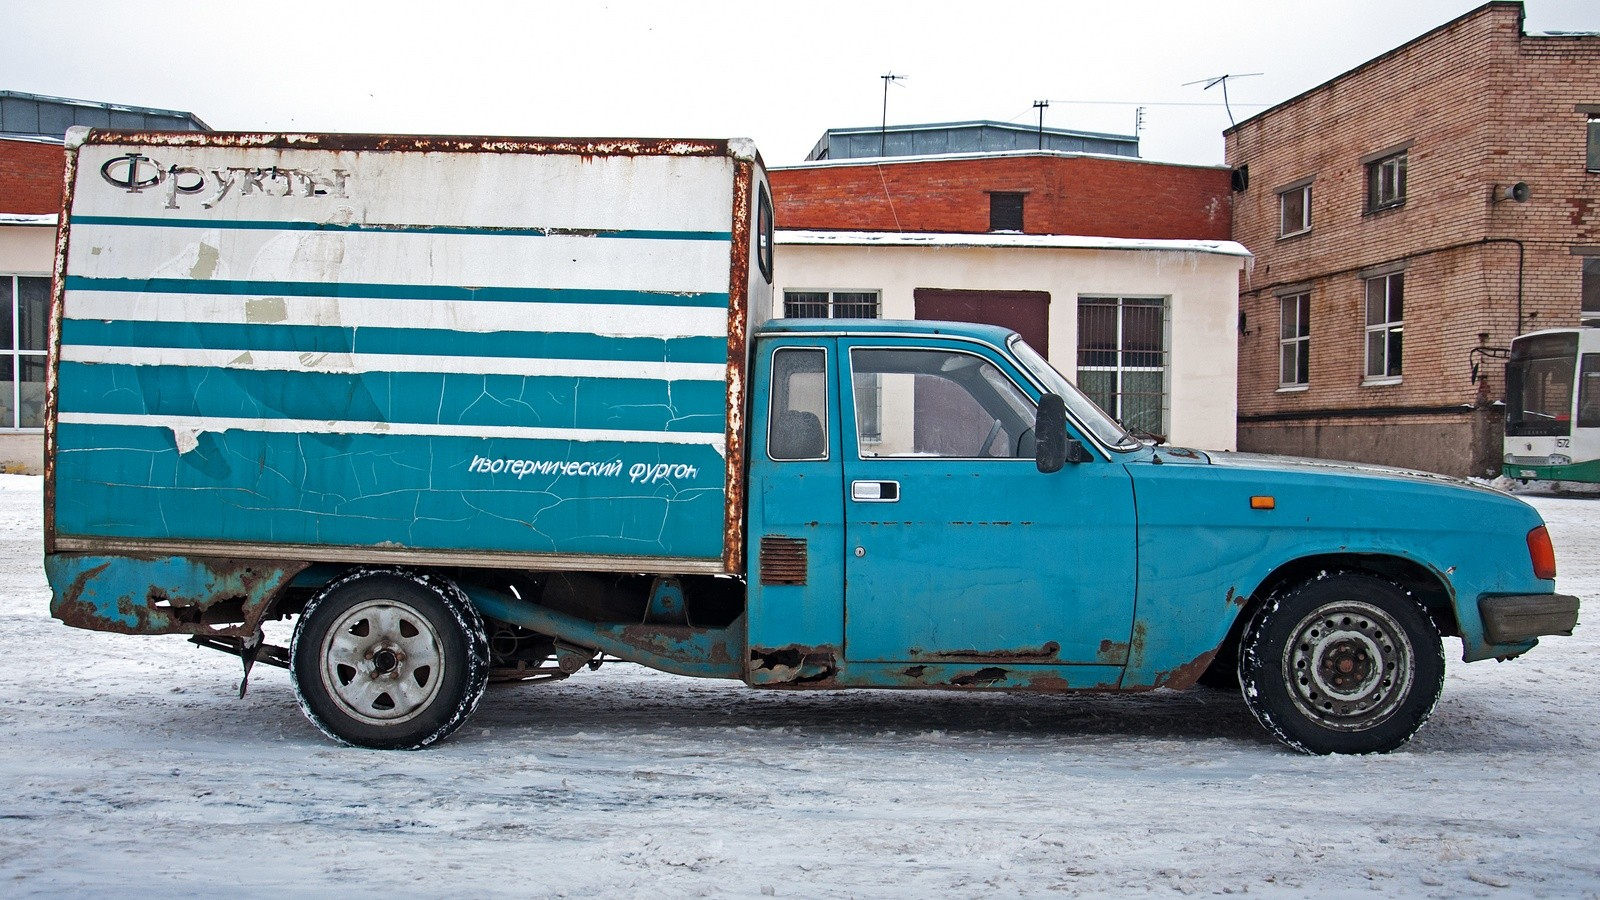 ГАЗ-2304 Бурлак сбоку